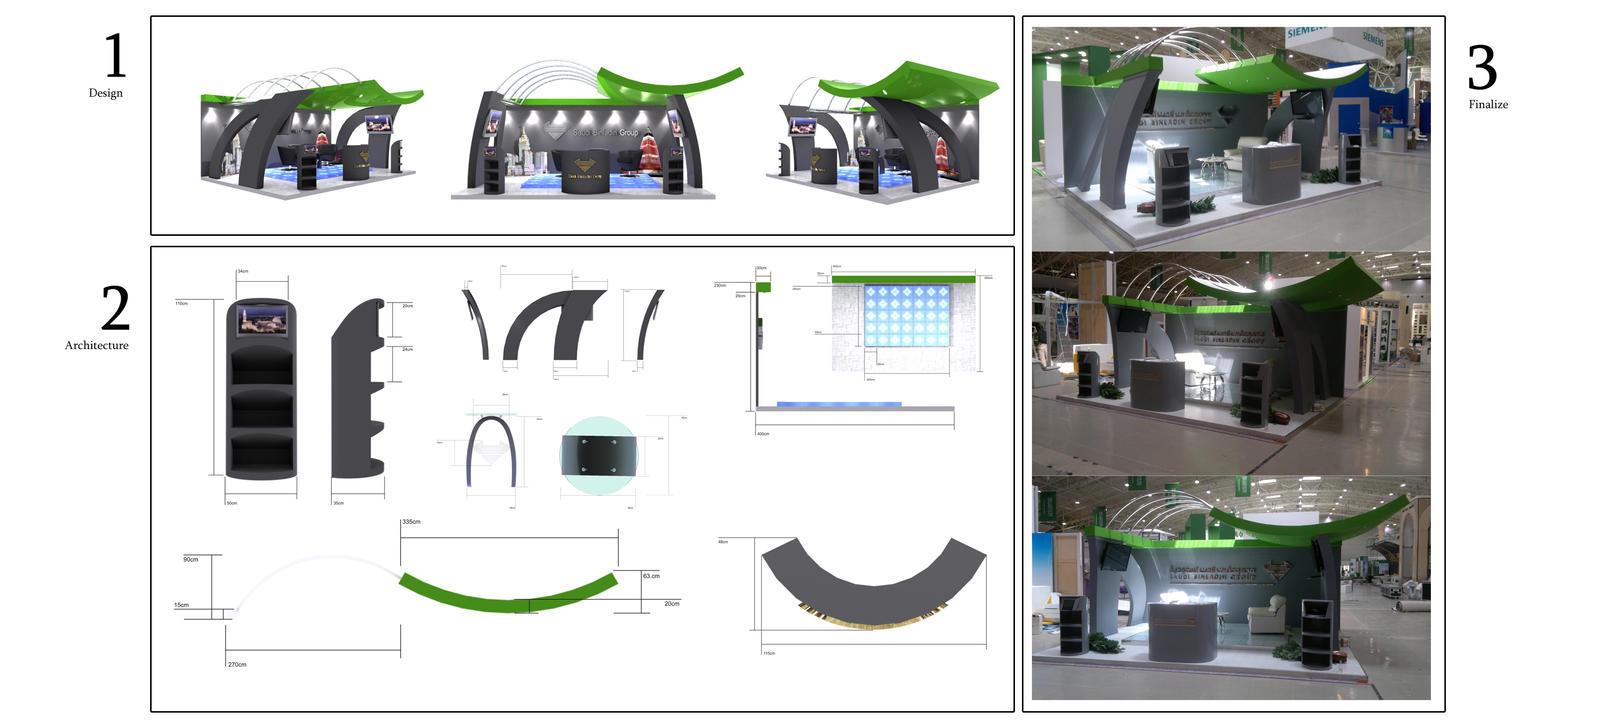 D Exhibition Designer Job In : Sbg exhibition design finalize by g studios on